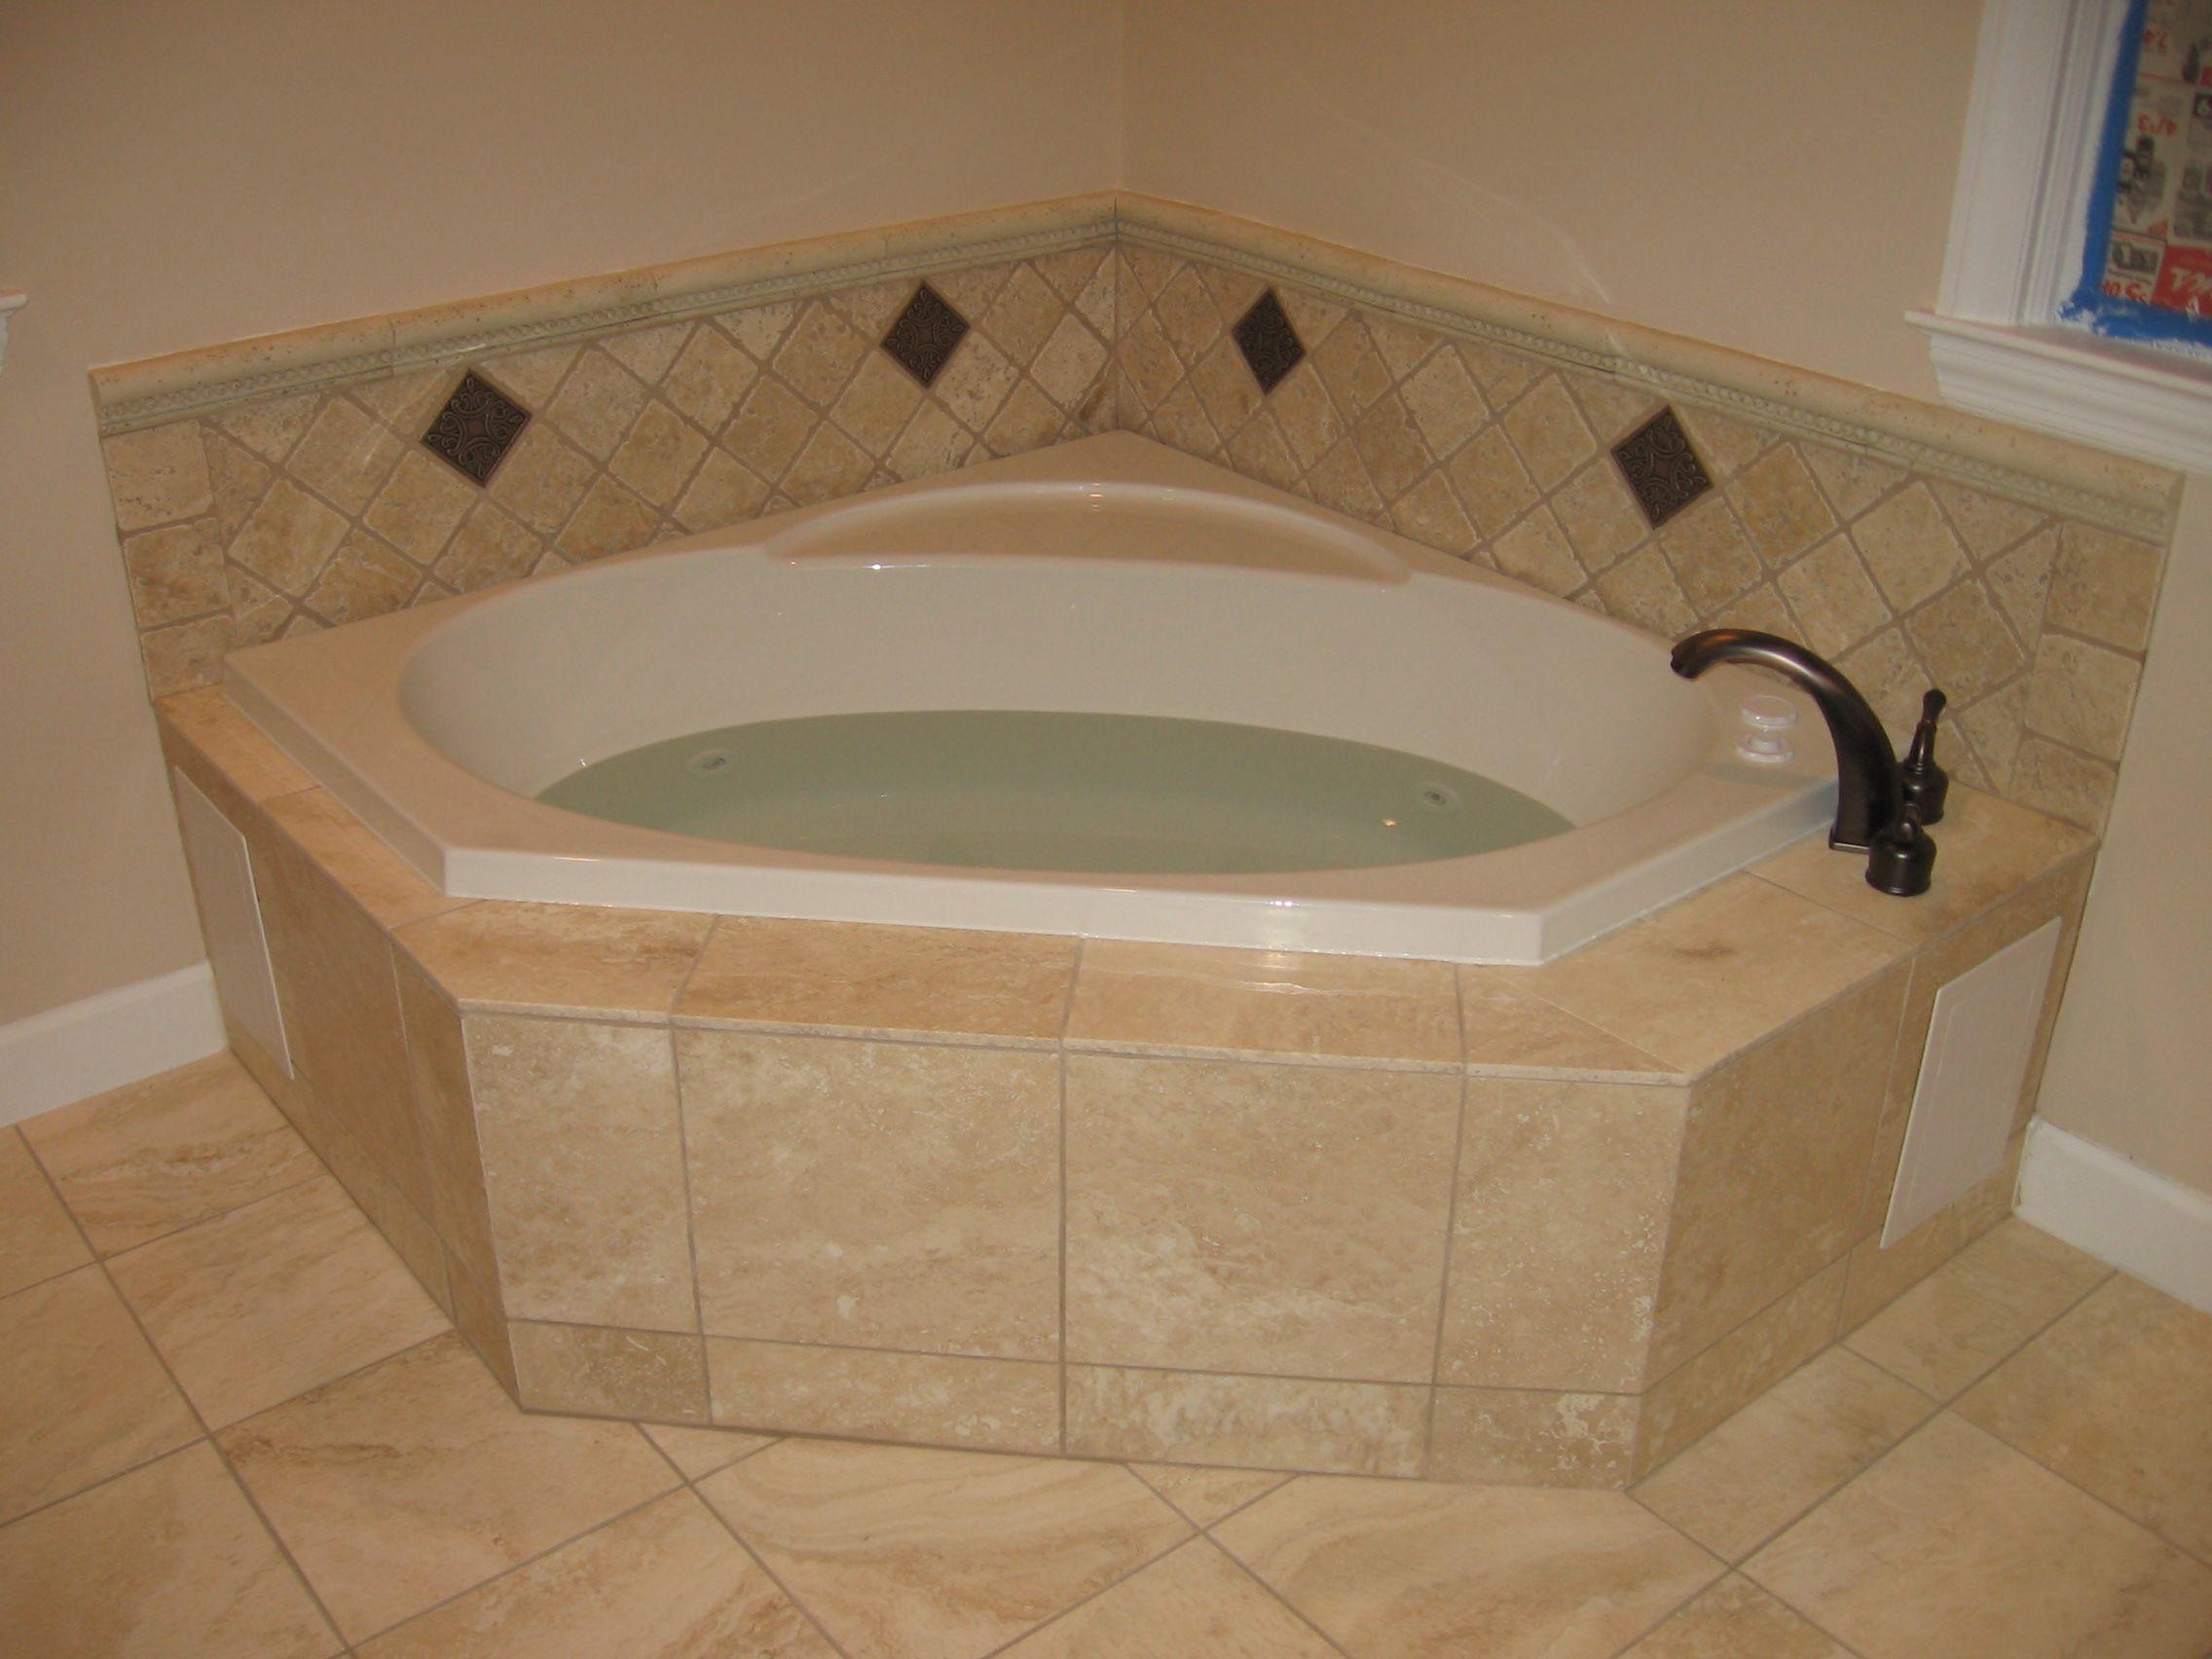 15 Interesting Whirlpool Corner Bathtub Picture Ideas